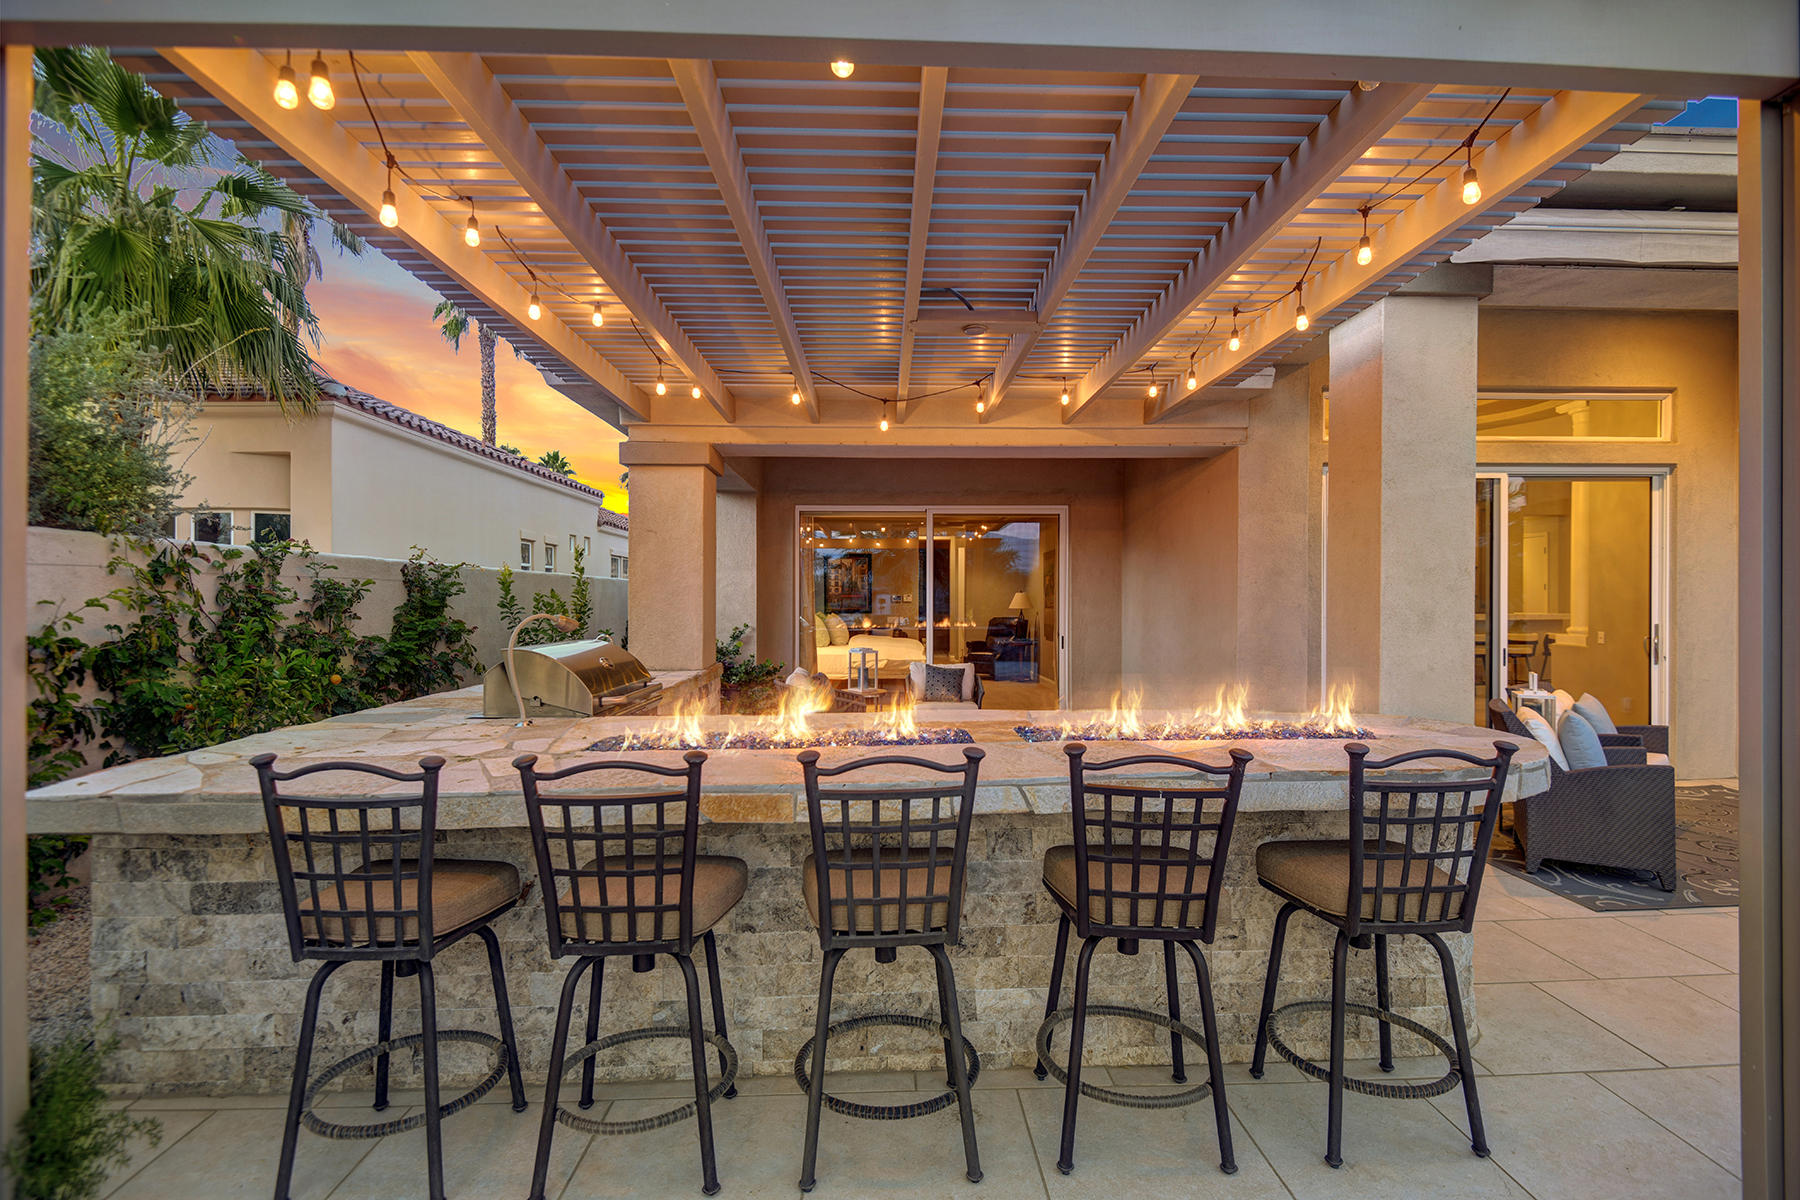 81695 Tiburon Drive, La Quinta, California 92253, 3 Bedrooms Bedrooms, ,4 BathroomsBathrooms,Residential,For Sale,81695 Tiburon Drive,219036796